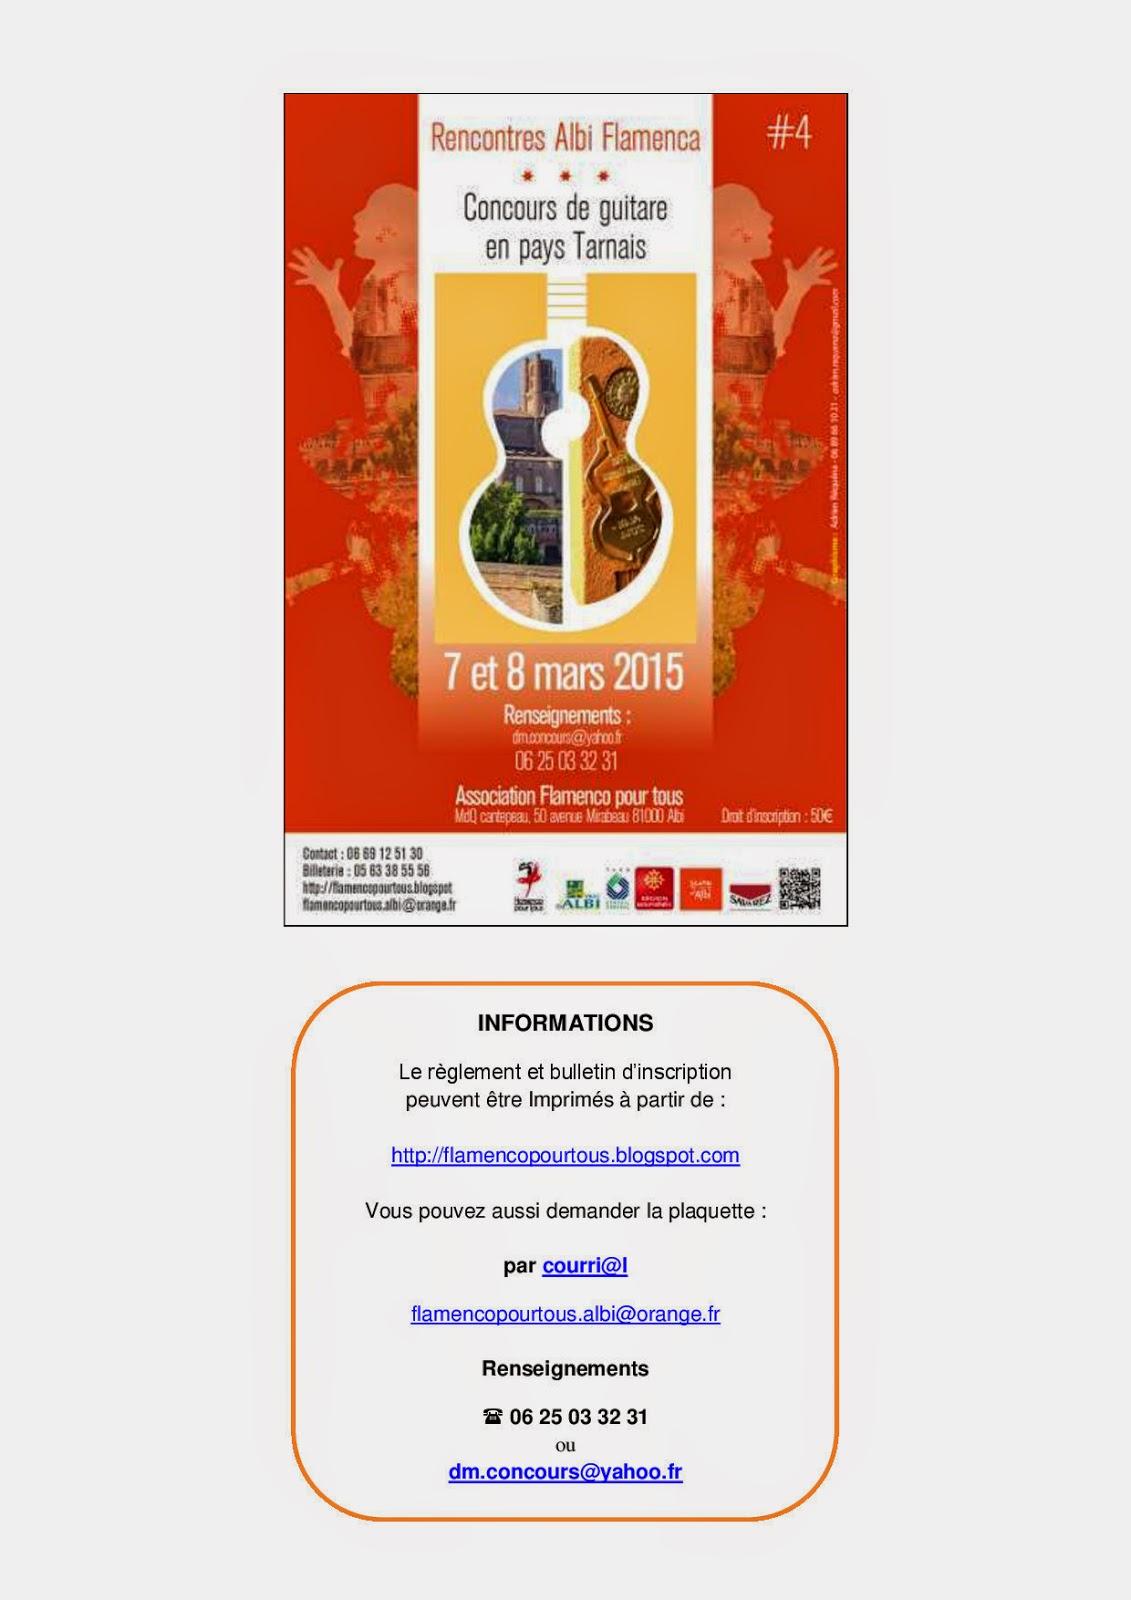 rencontres albi flamenca 2014 lloydminster